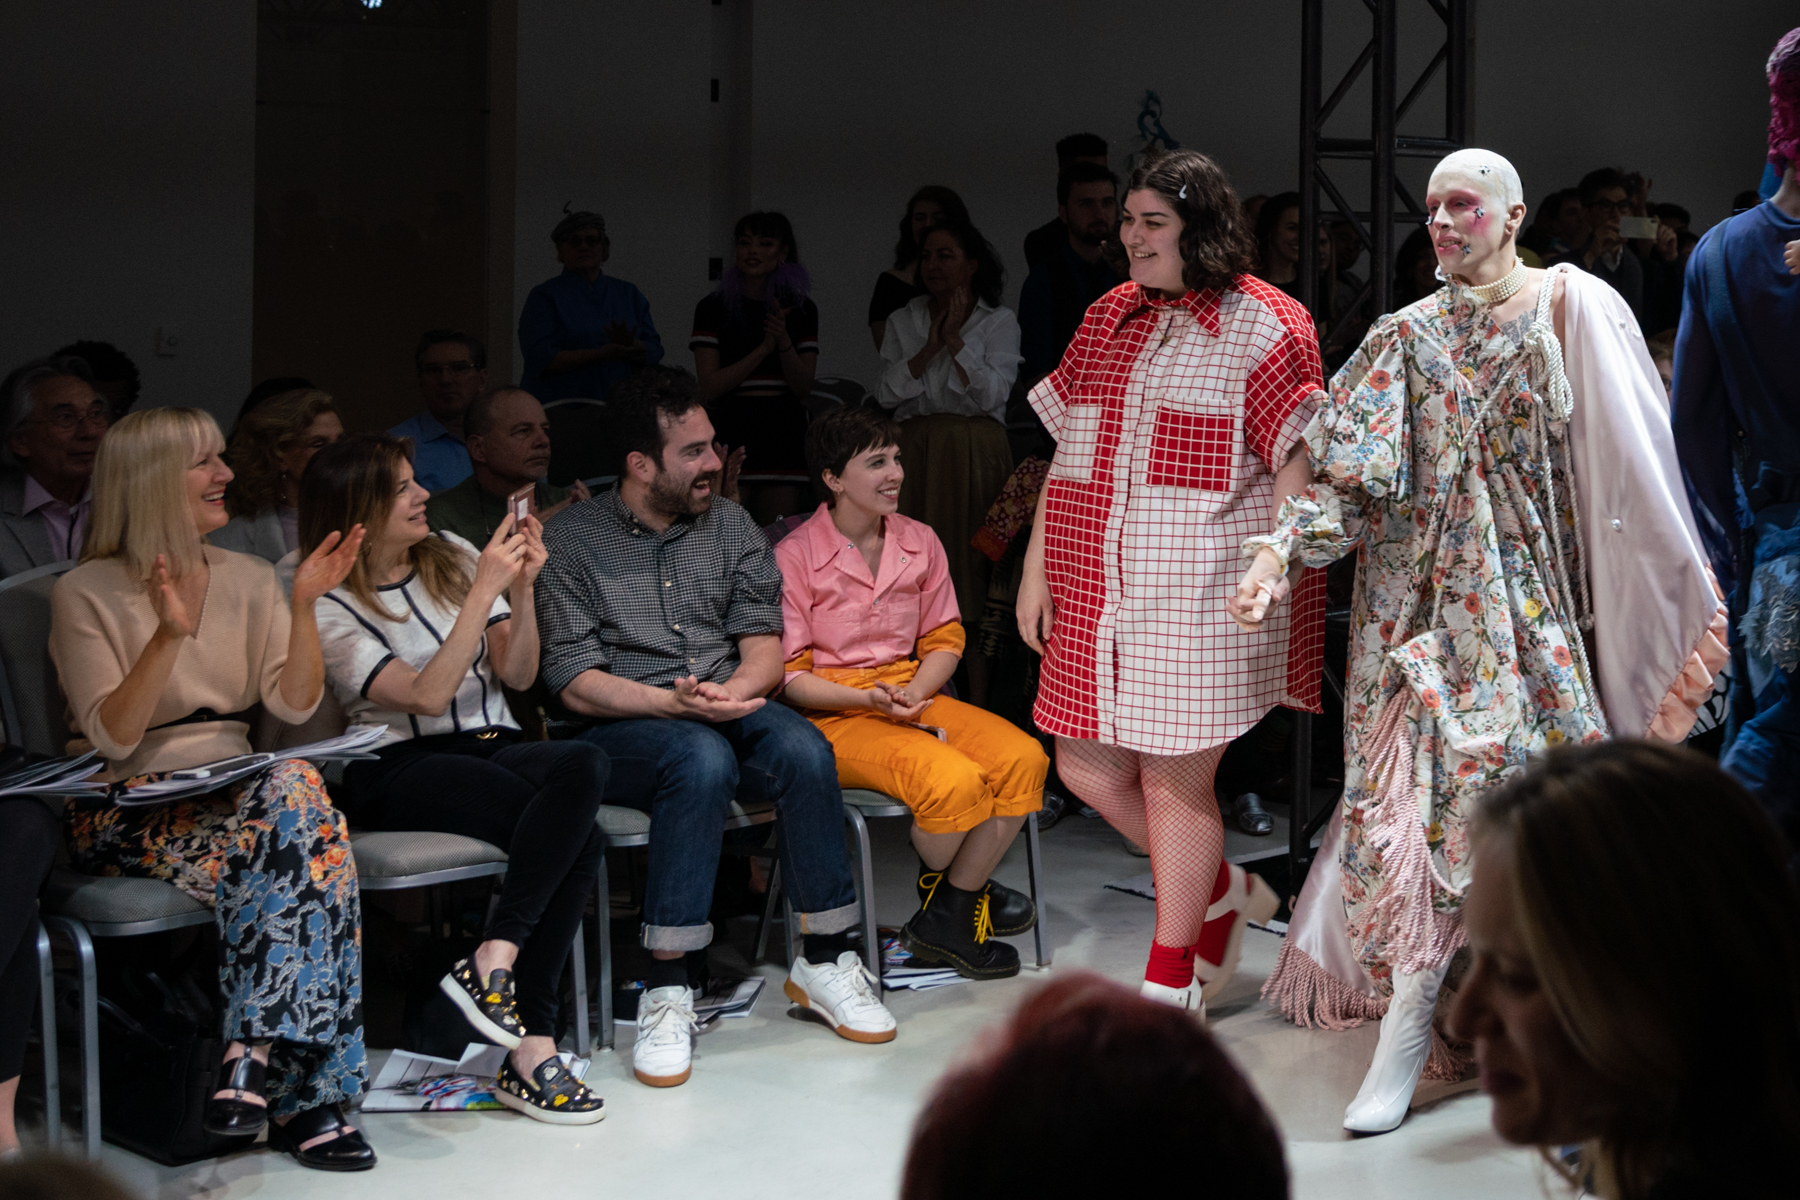 connor_fenwick_saic_fashion_event_09.jpg